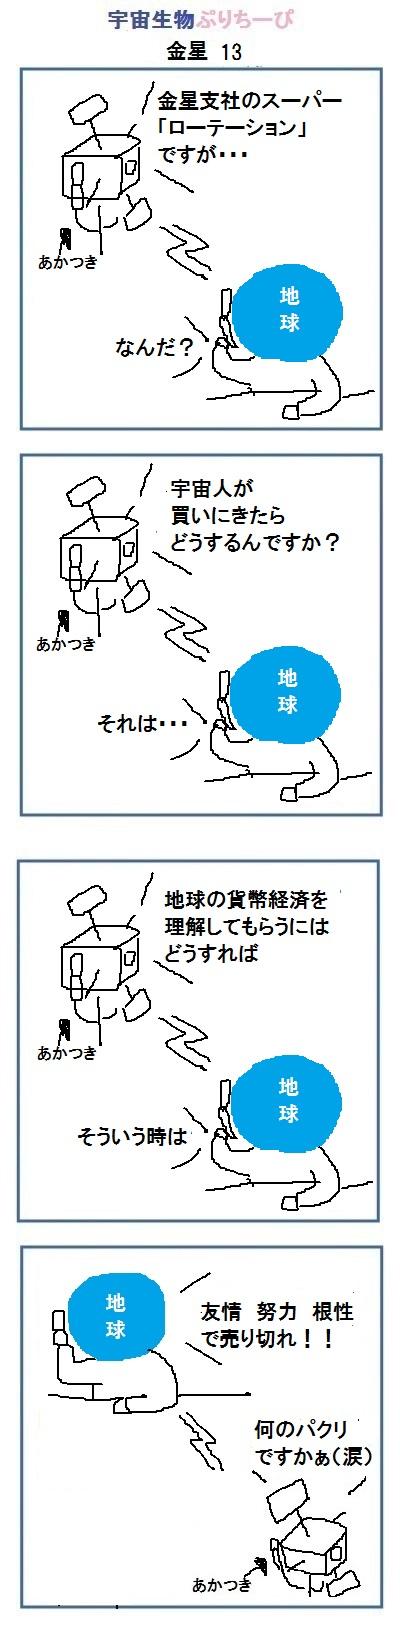 160530_kinsei13.jpg